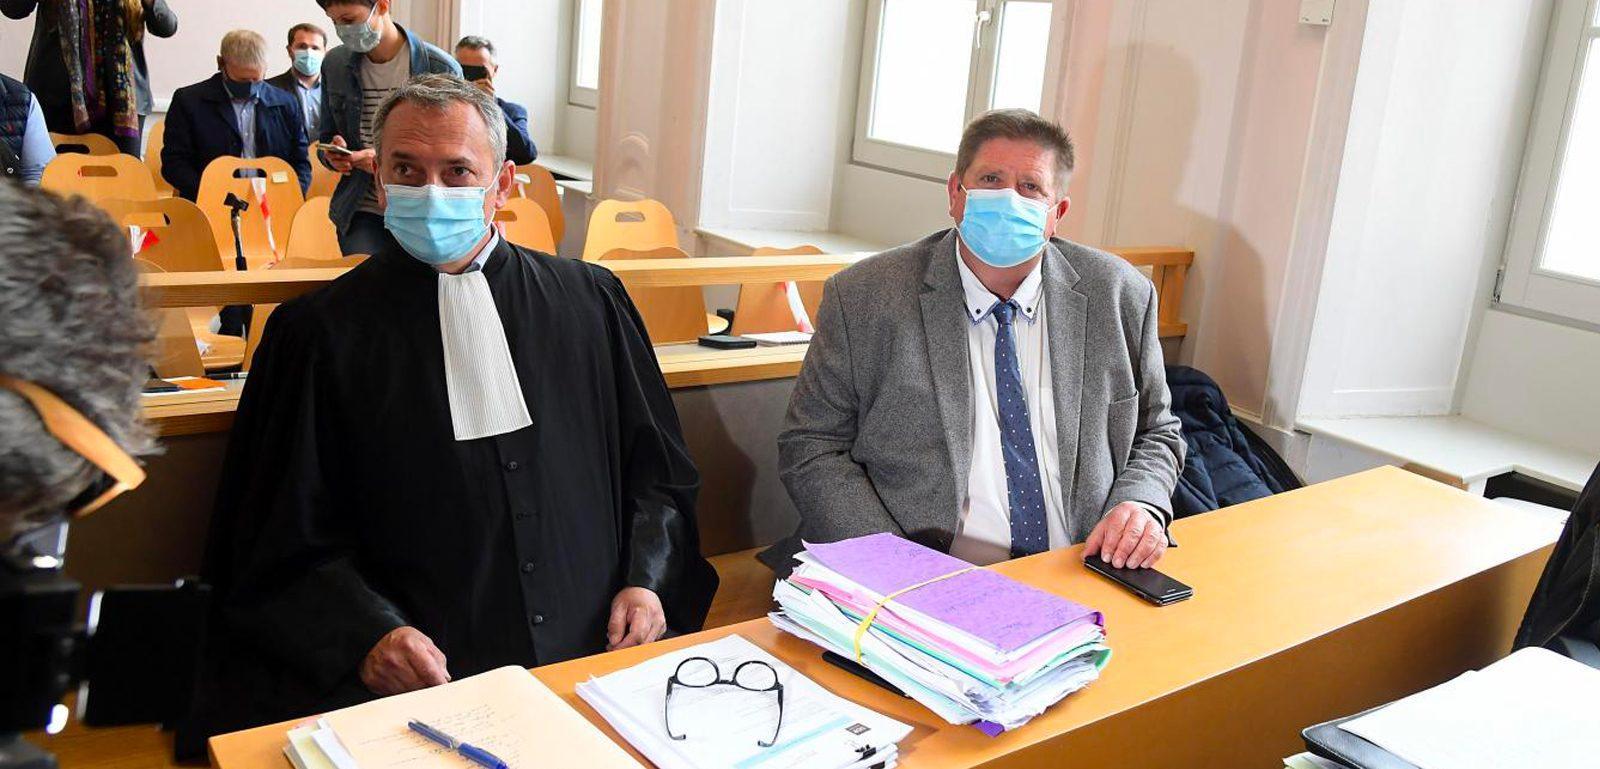 Procès menaces contre Willy Schraen